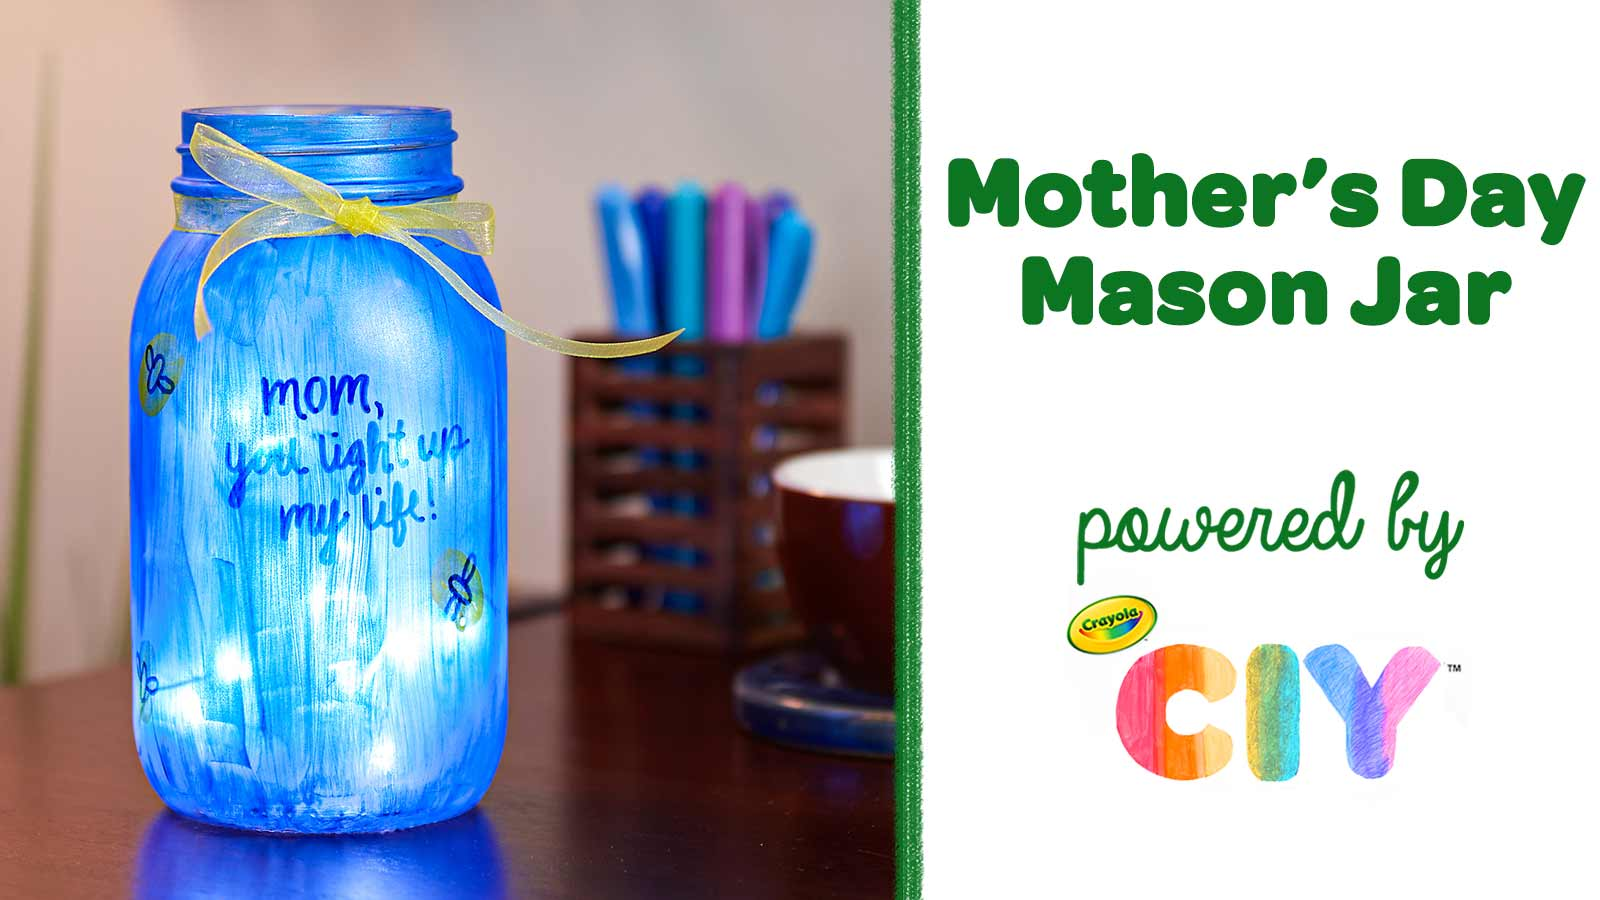 Diy Mother S Day Mason Jar Craft Crafts Crayola Com Crayola Ciy Diy Crafts For Kids And Adults Crayola Com